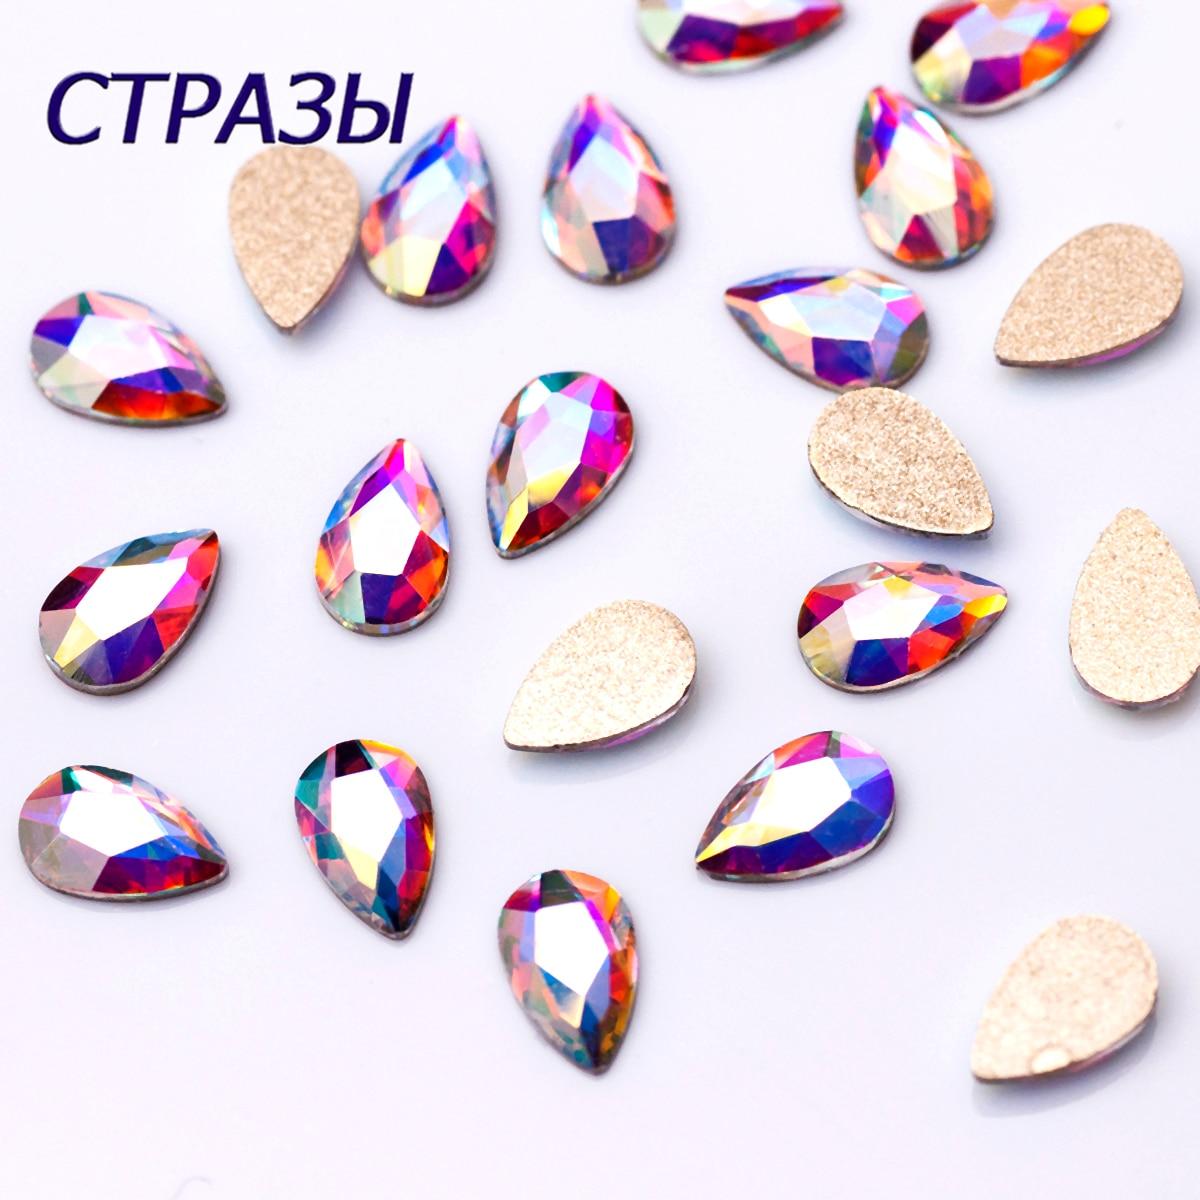 20PCS TOP Quality Strass Korean Fashion 3D Nail Art Rhinestone Pear Flatback Pixie Crystal Stones For DIY Nail art Decoration